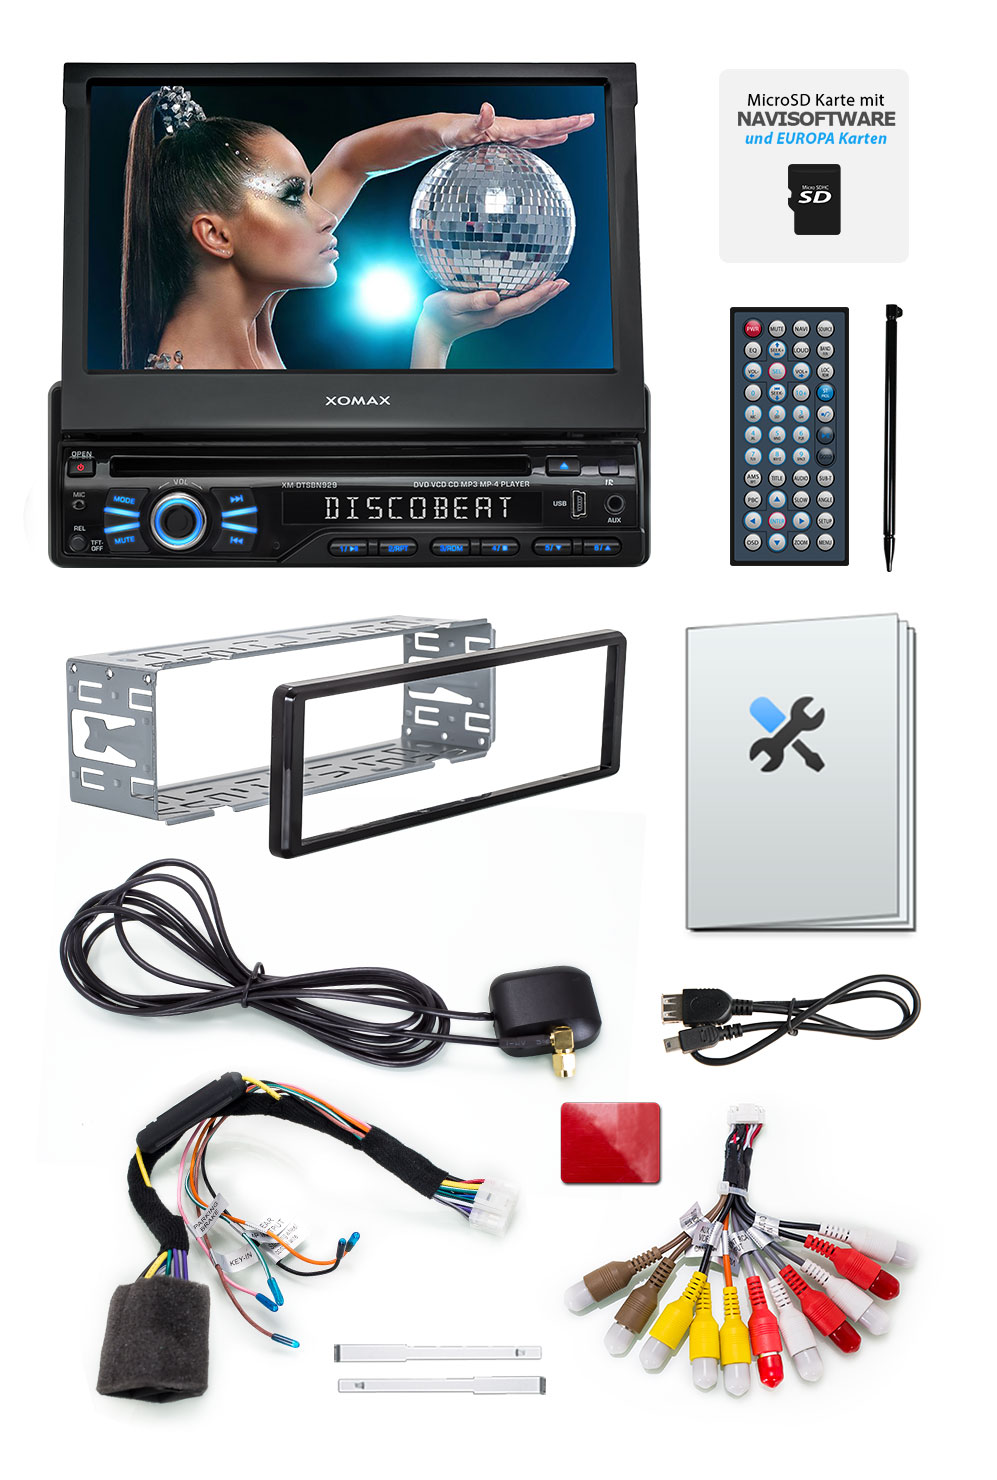 autoradio mit navigation gps touchscreen bildschirm. Black Bedroom Furniture Sets. Home Design Ideas